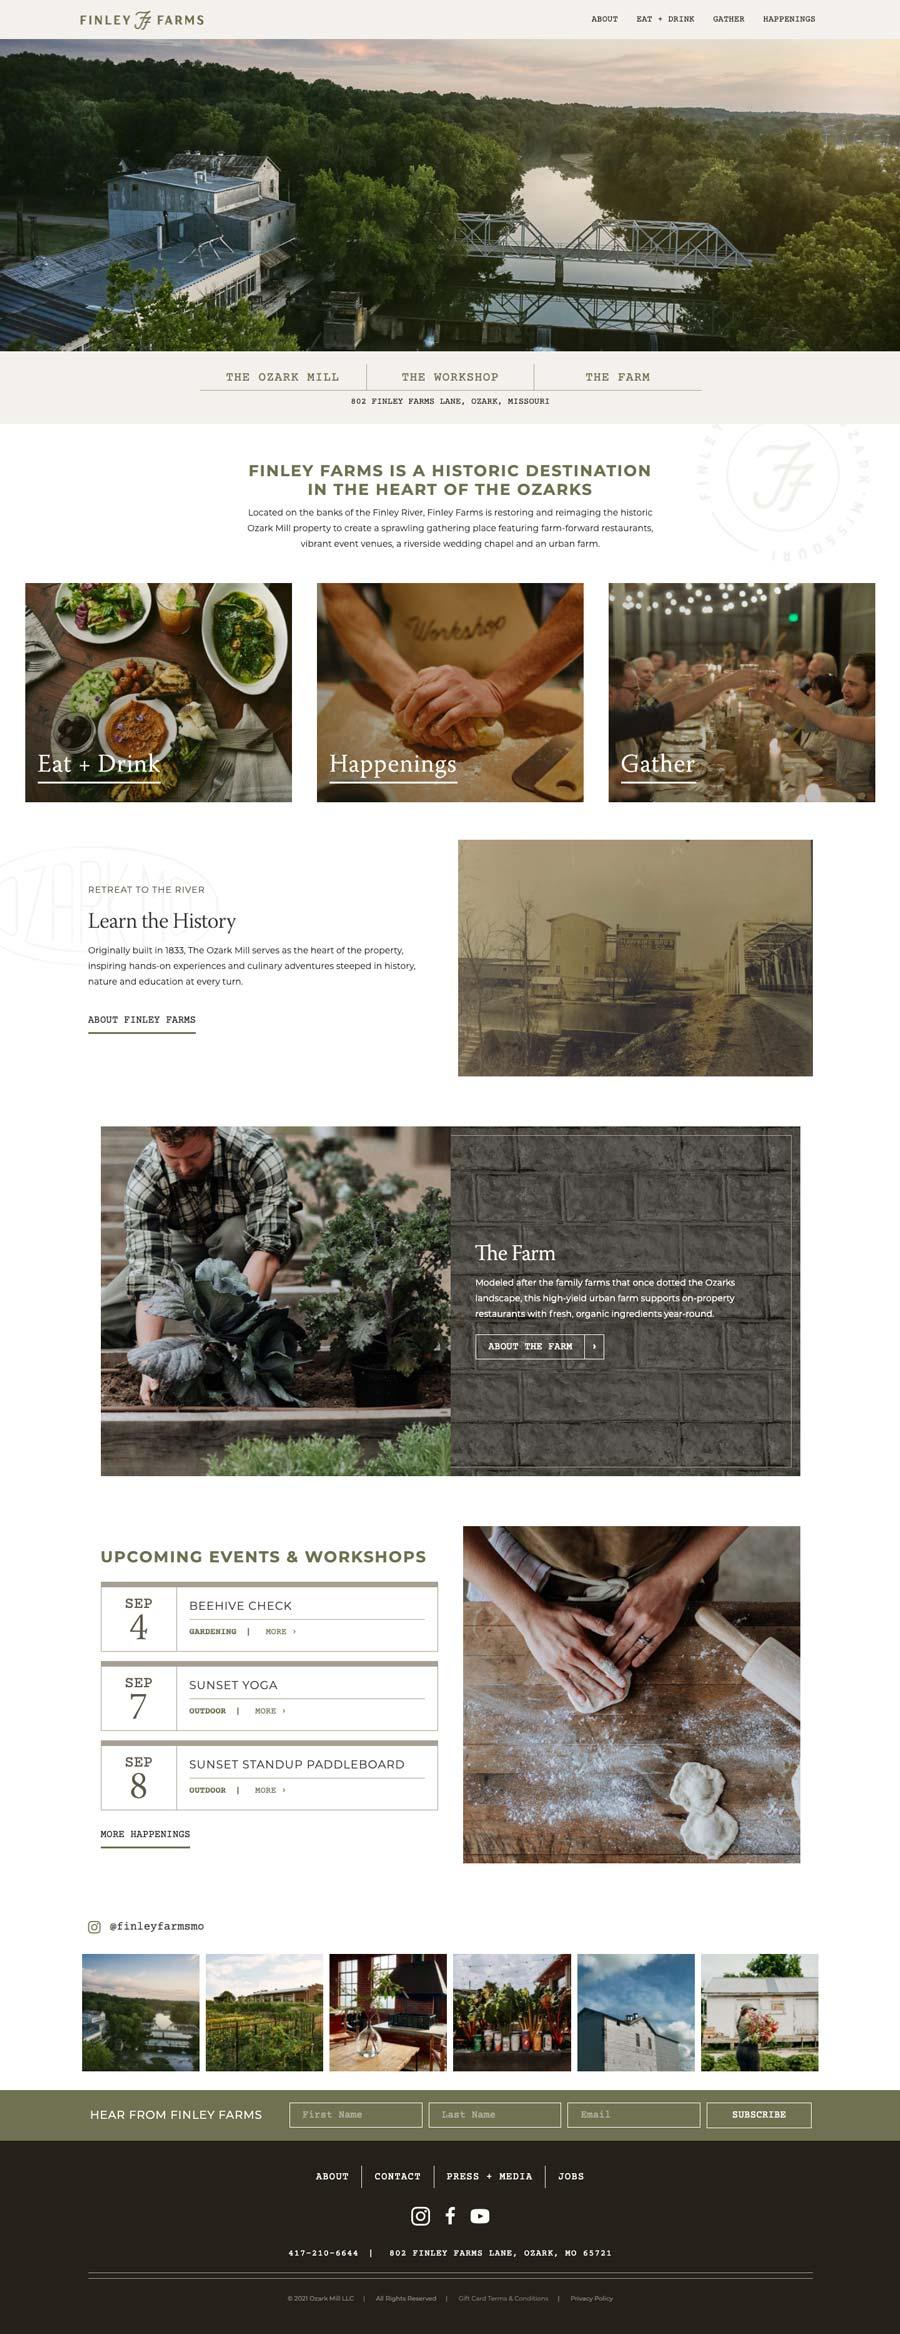 Finley Farms Homepage